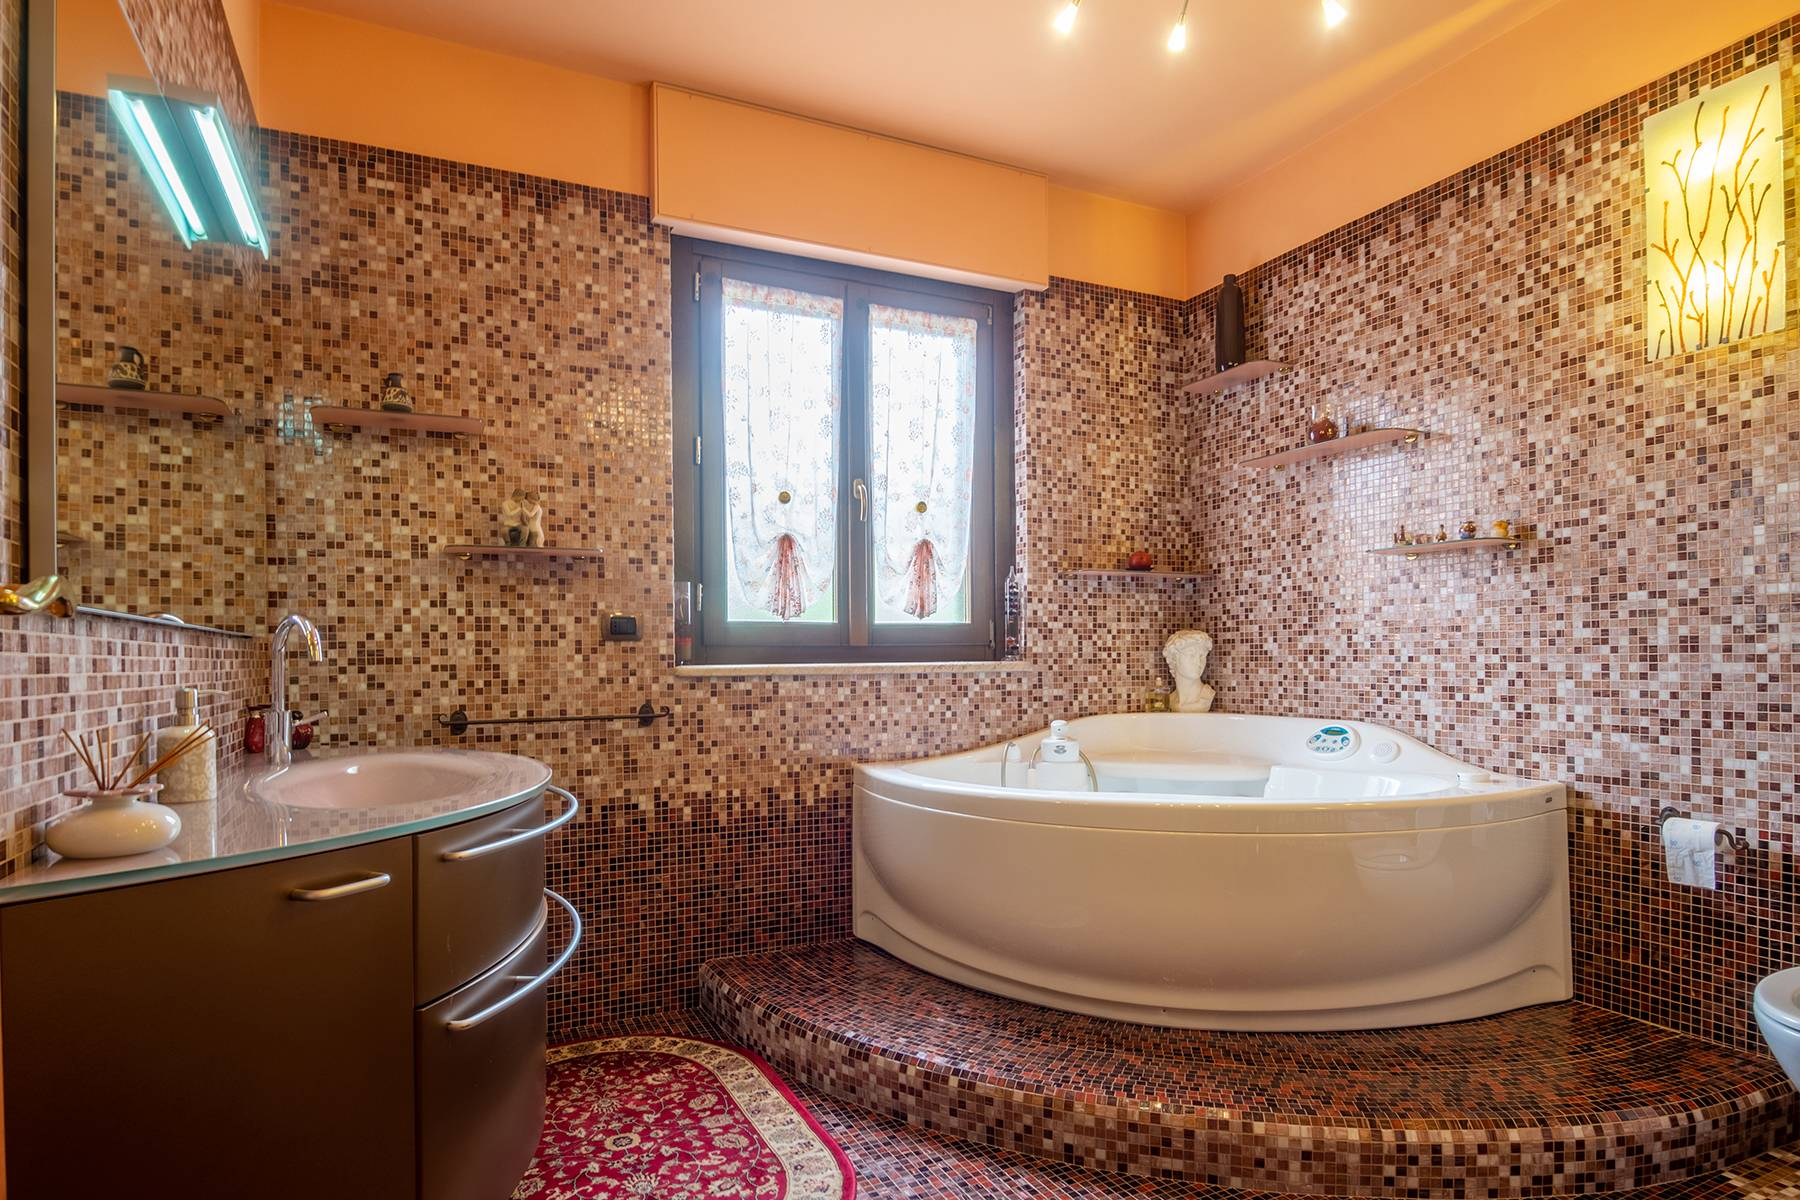 Villa in Vendita a Rosta: 5 locali, 182 mq - Foto 14